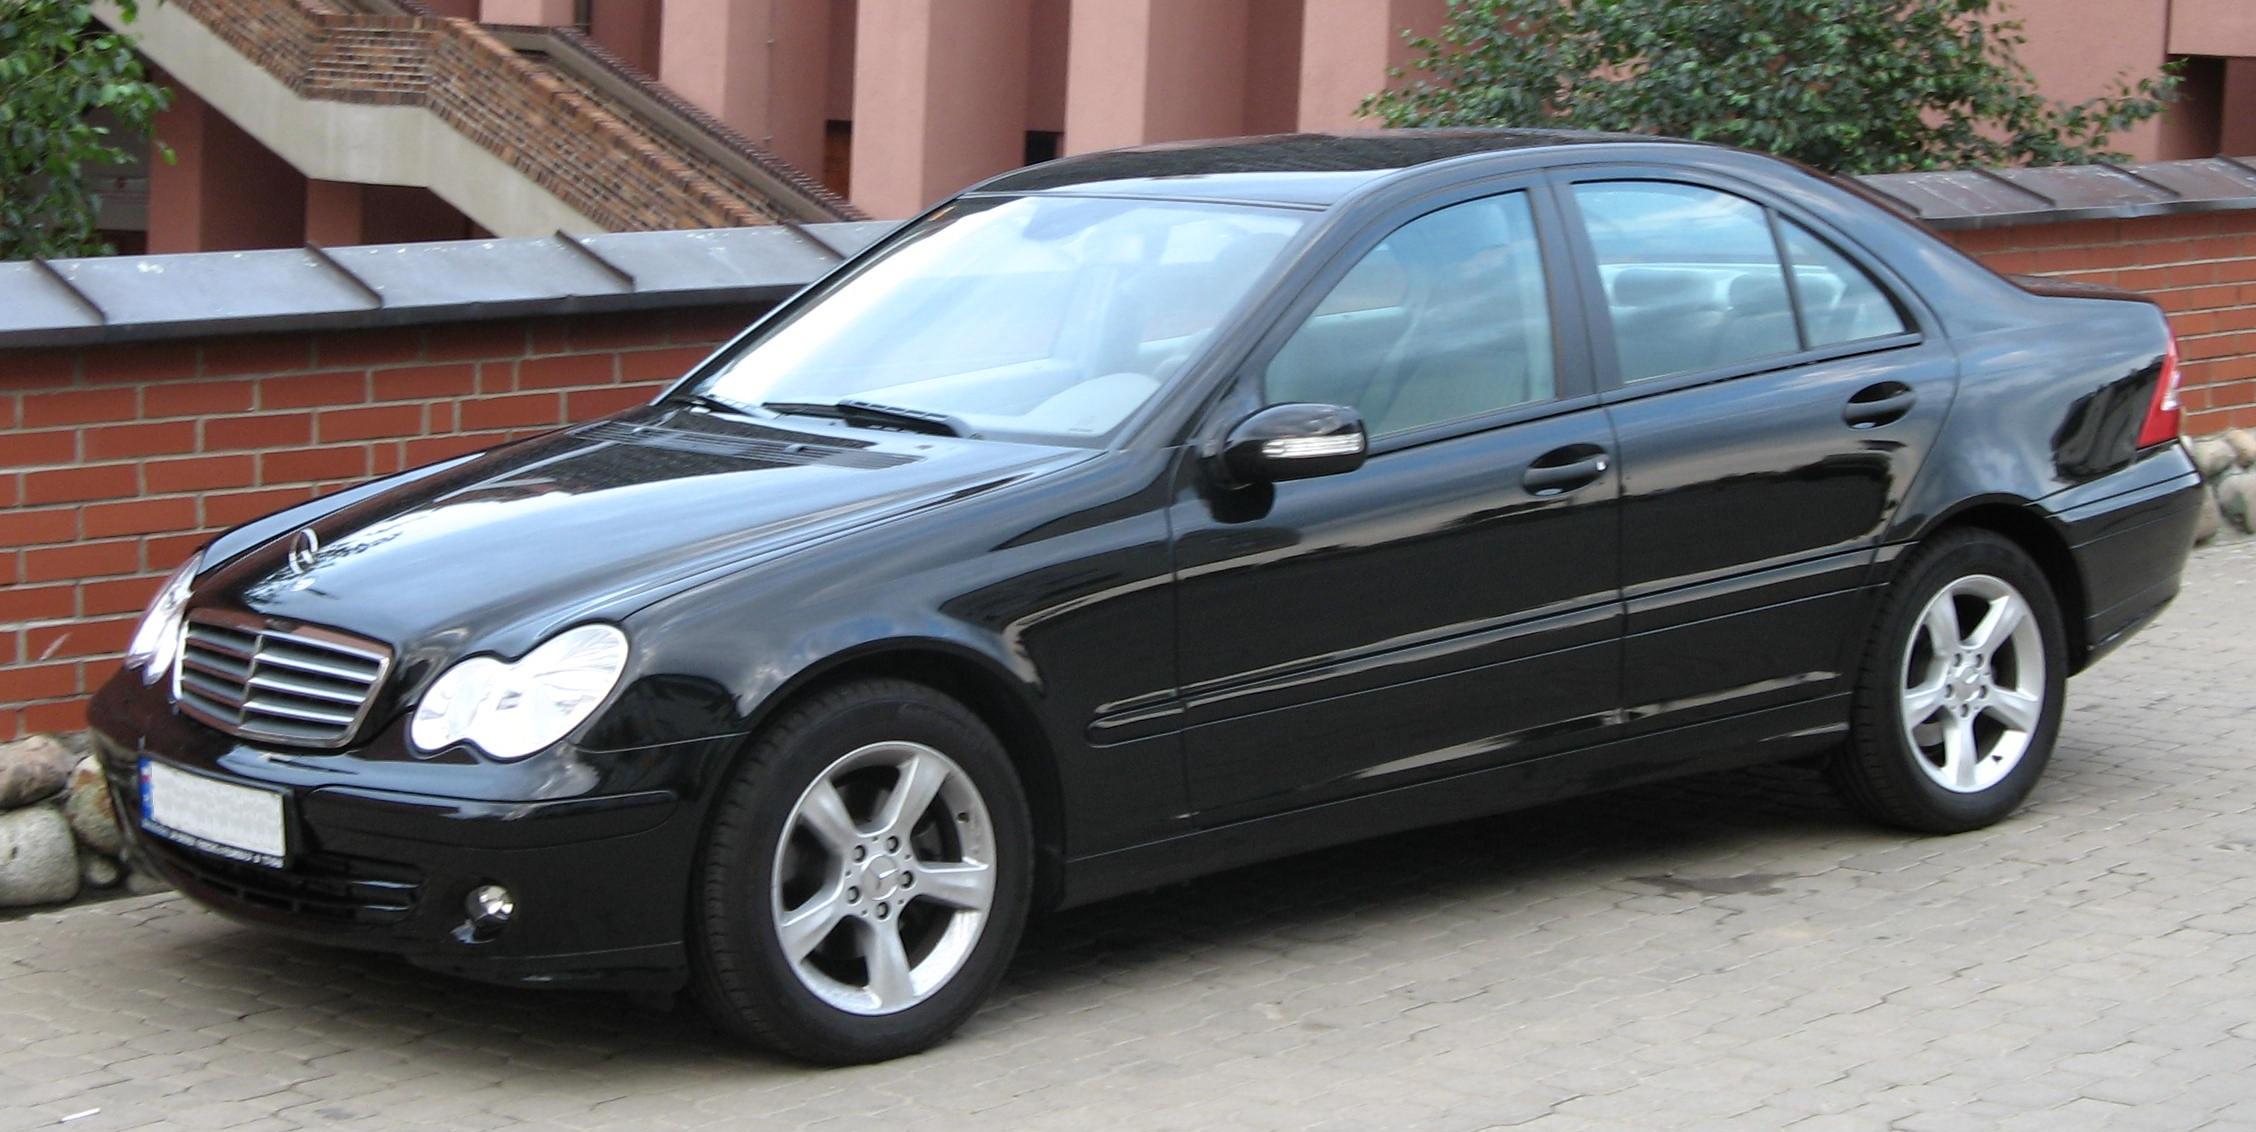 Permalink to Mercedes Benz C Class Price